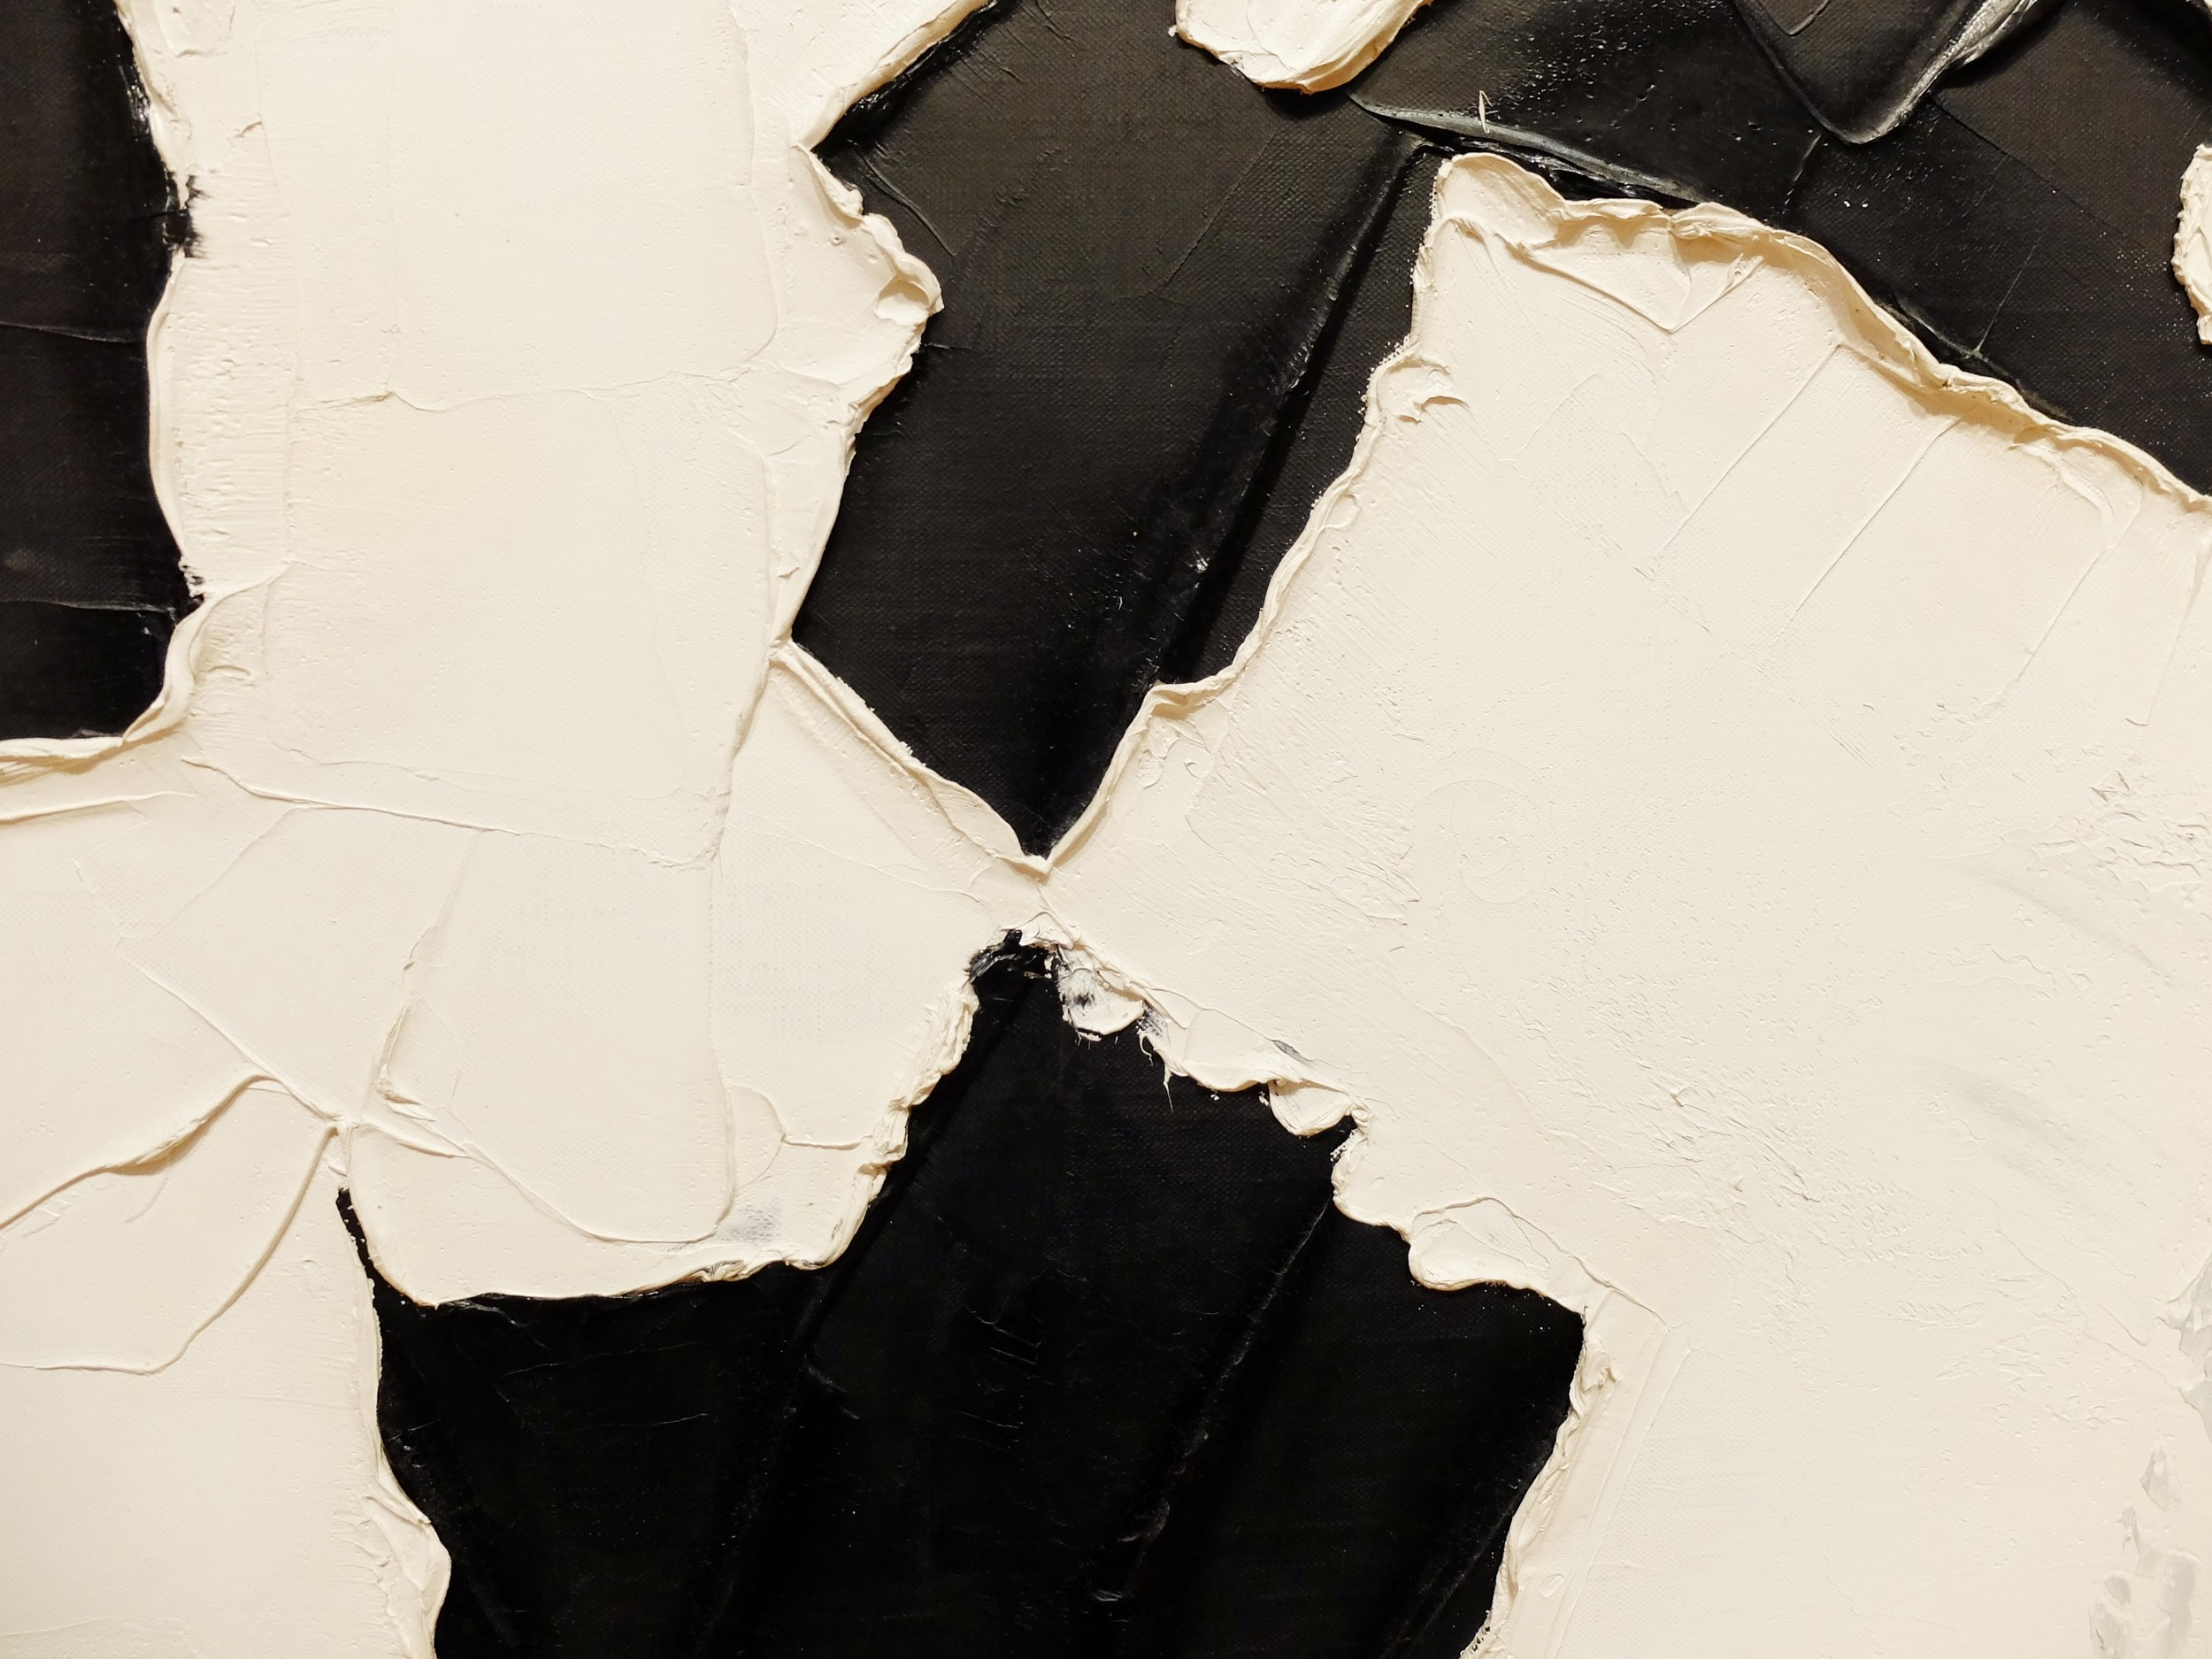 detail Paul-Émile Borduas, 3+4+1 , 1956, oil on canvas, 199.8 x 250 cm, National Gallery of Canada, Ottawa